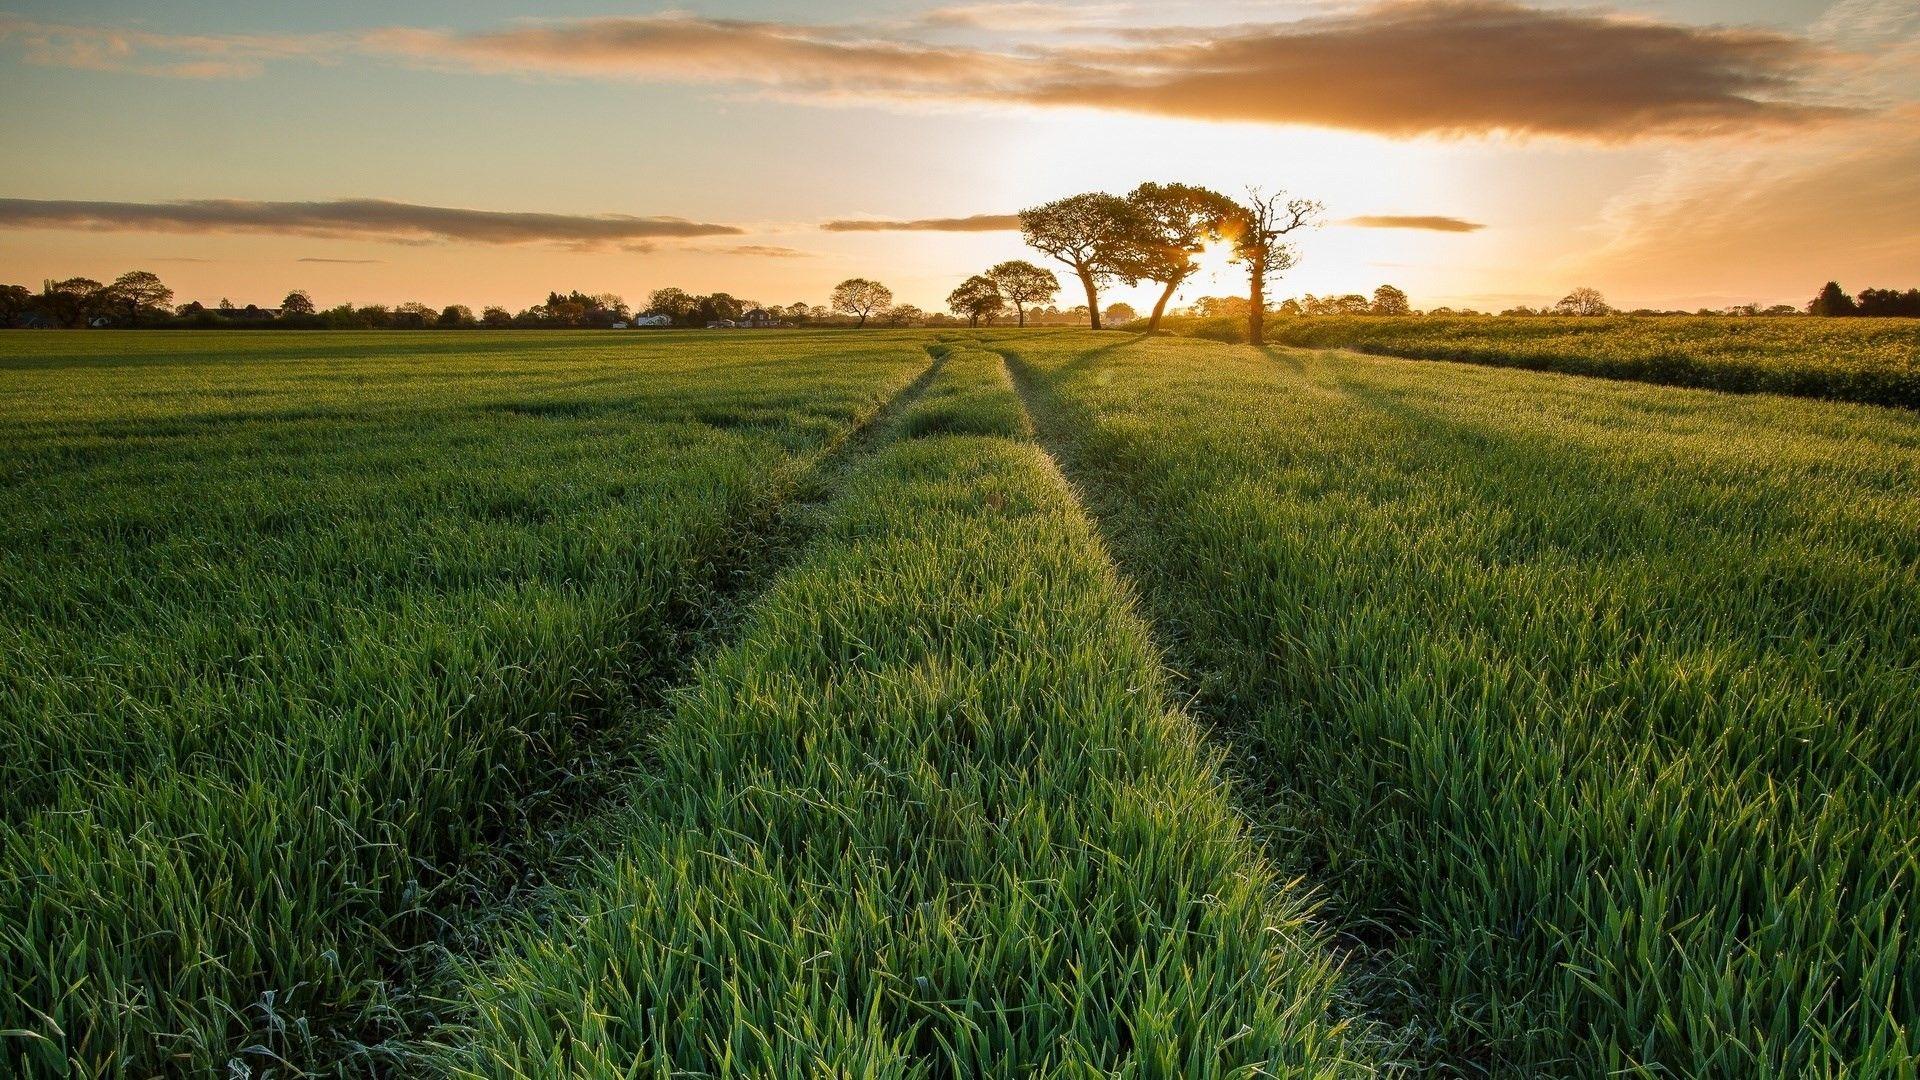 Daily News Scenic Roads Scenic Landscape Hd wallpaper field road summer grass